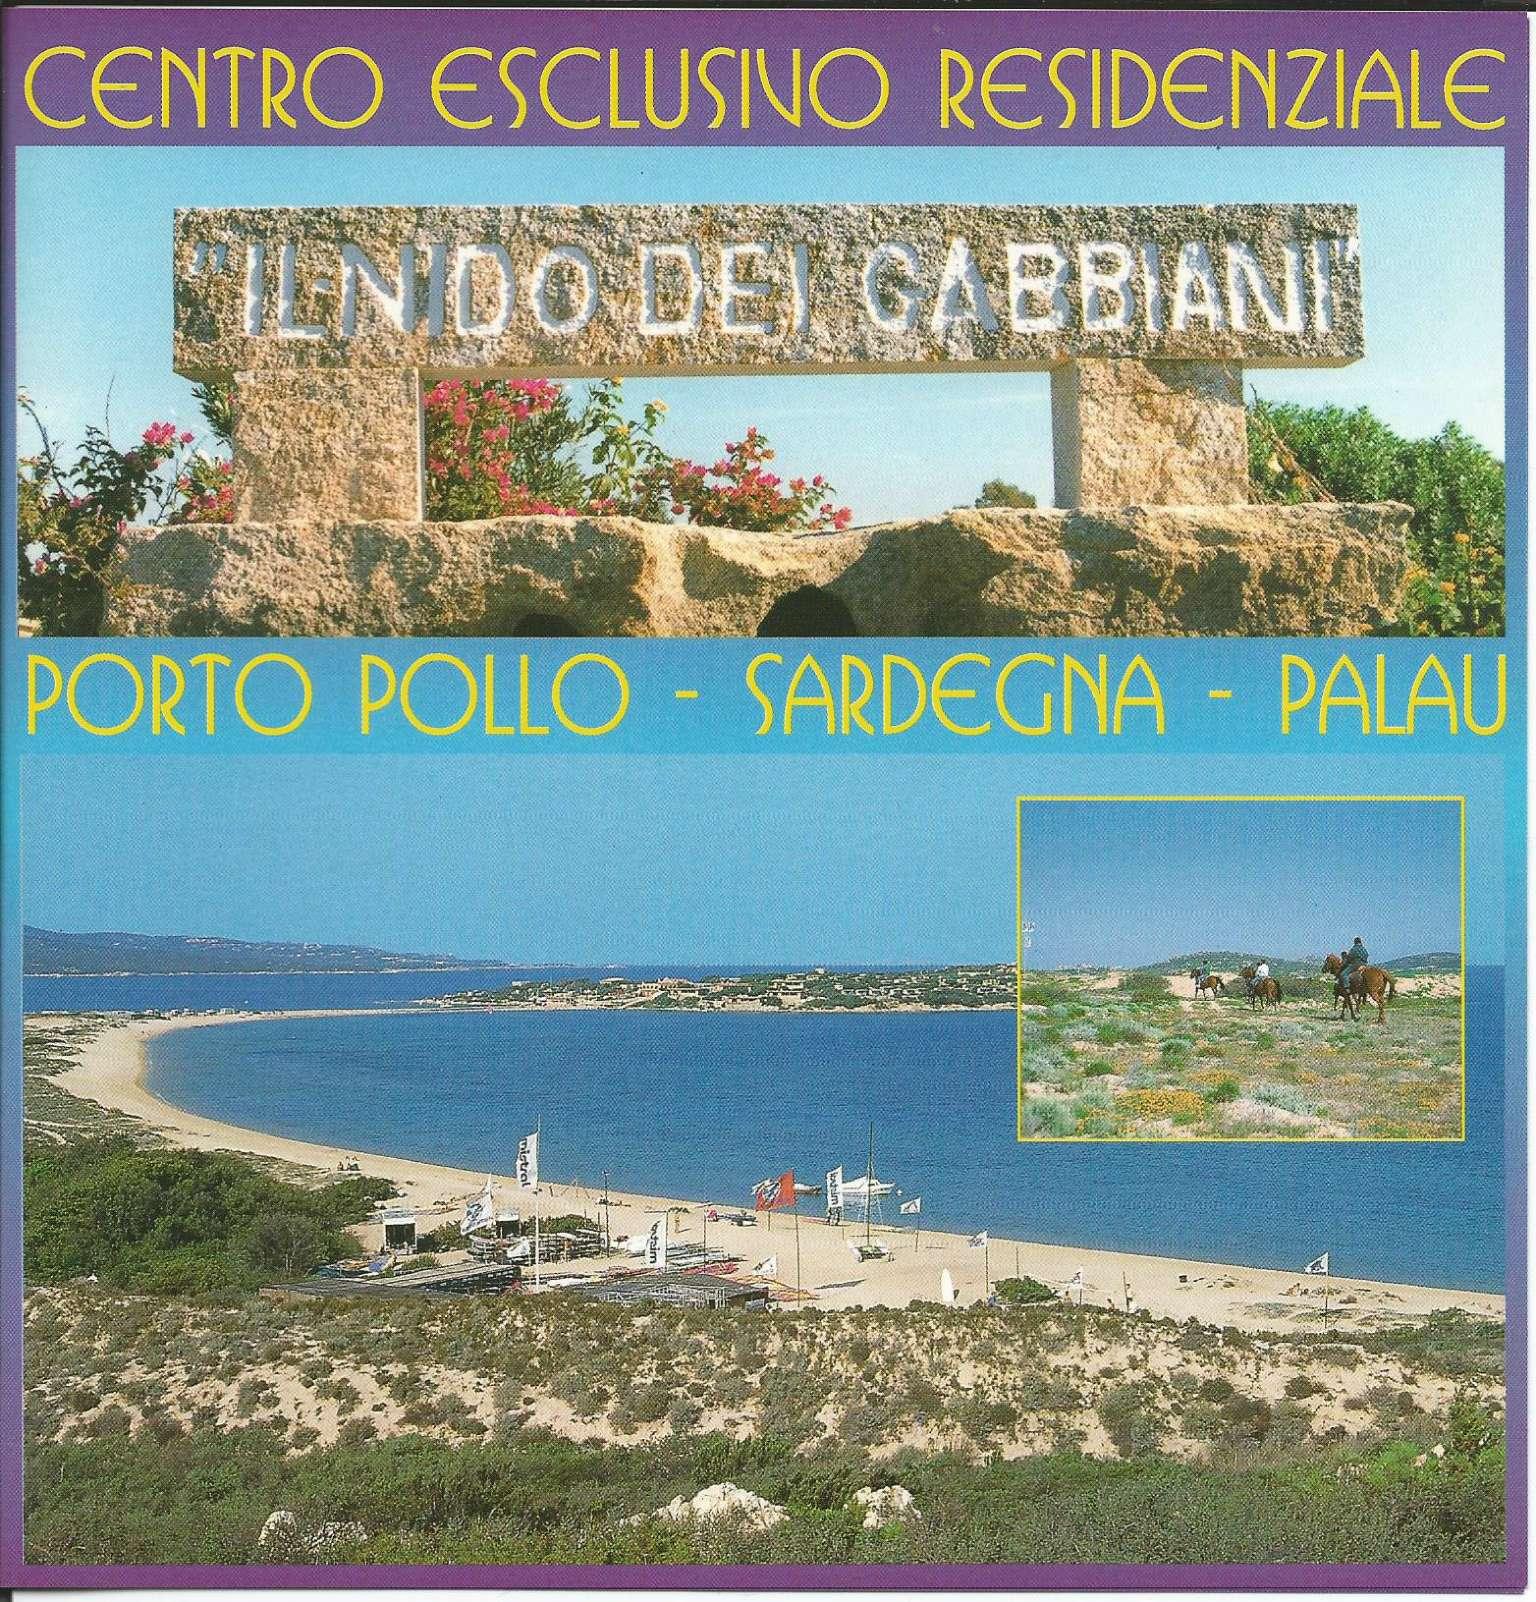 Bilocale vendita palau provinciale barrabisa for Planimetrie da 4000 piedi quadrati